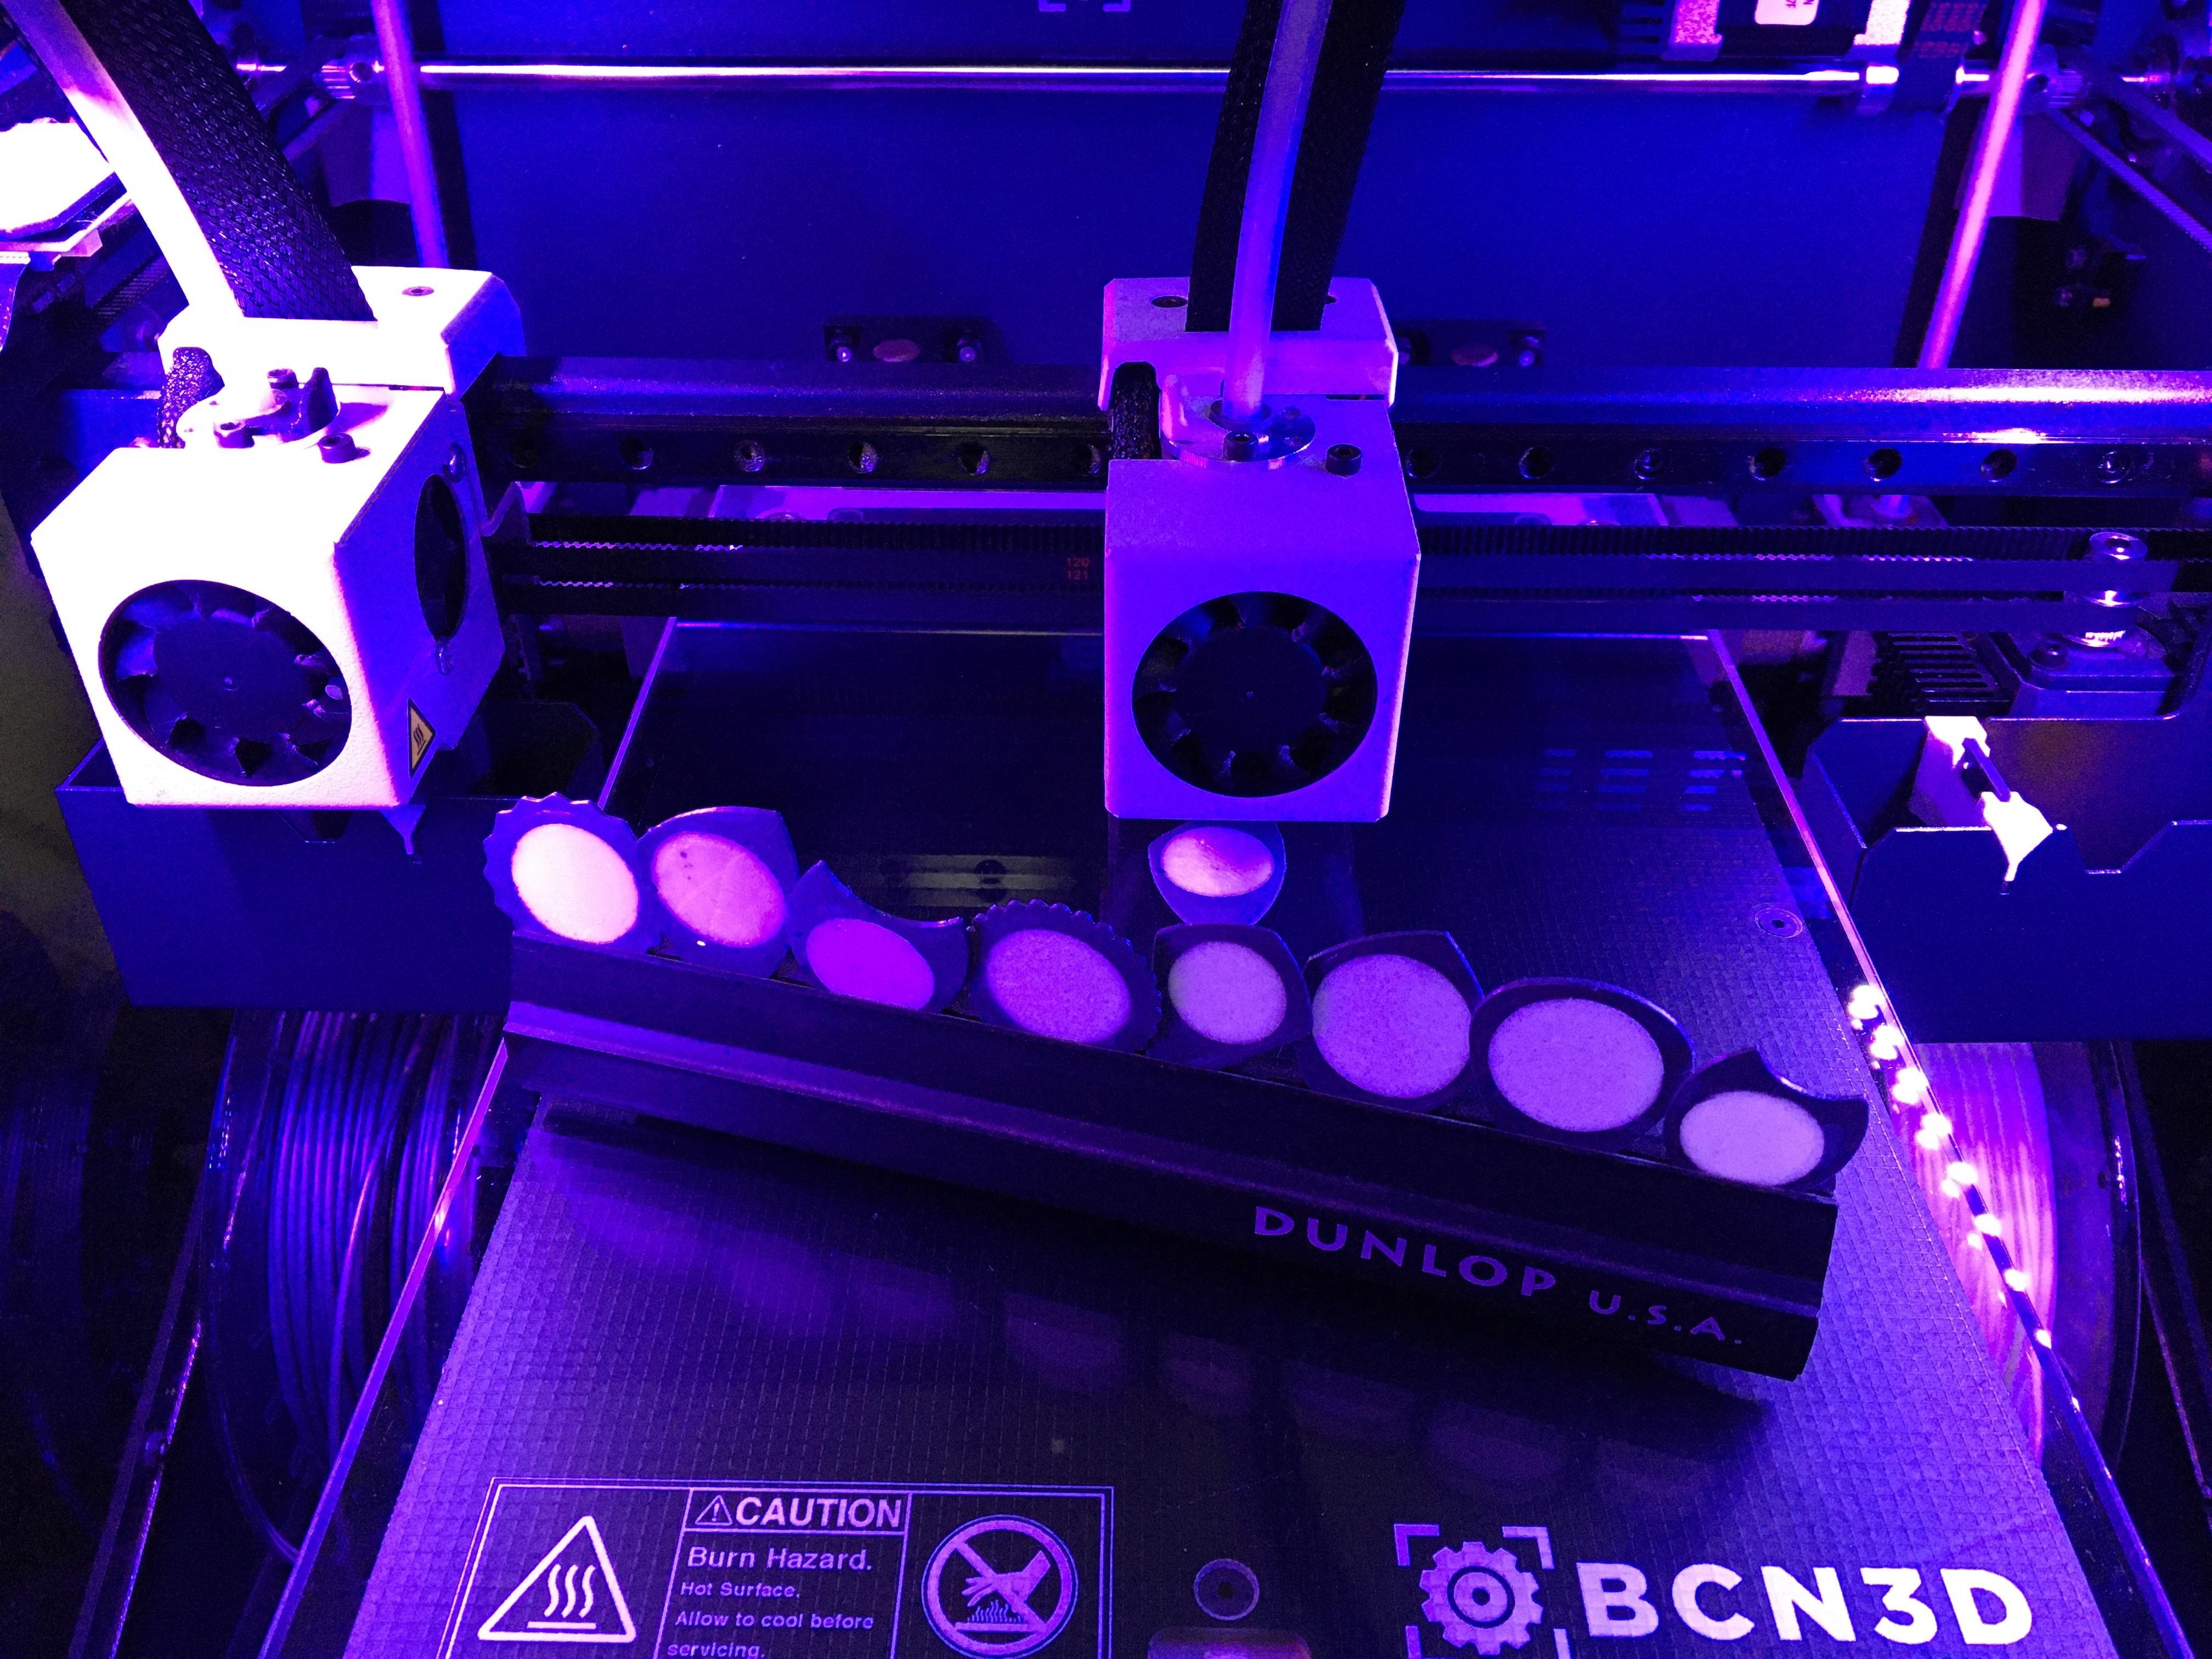 1FAFC935-4B16-40DA-AF1B-079D27375243.jpeg Download free STL file KVAR Pua Nido Carbon Fiber and Black TPU (Nest Pick Guitar) • 3D printer object, carleslluisar